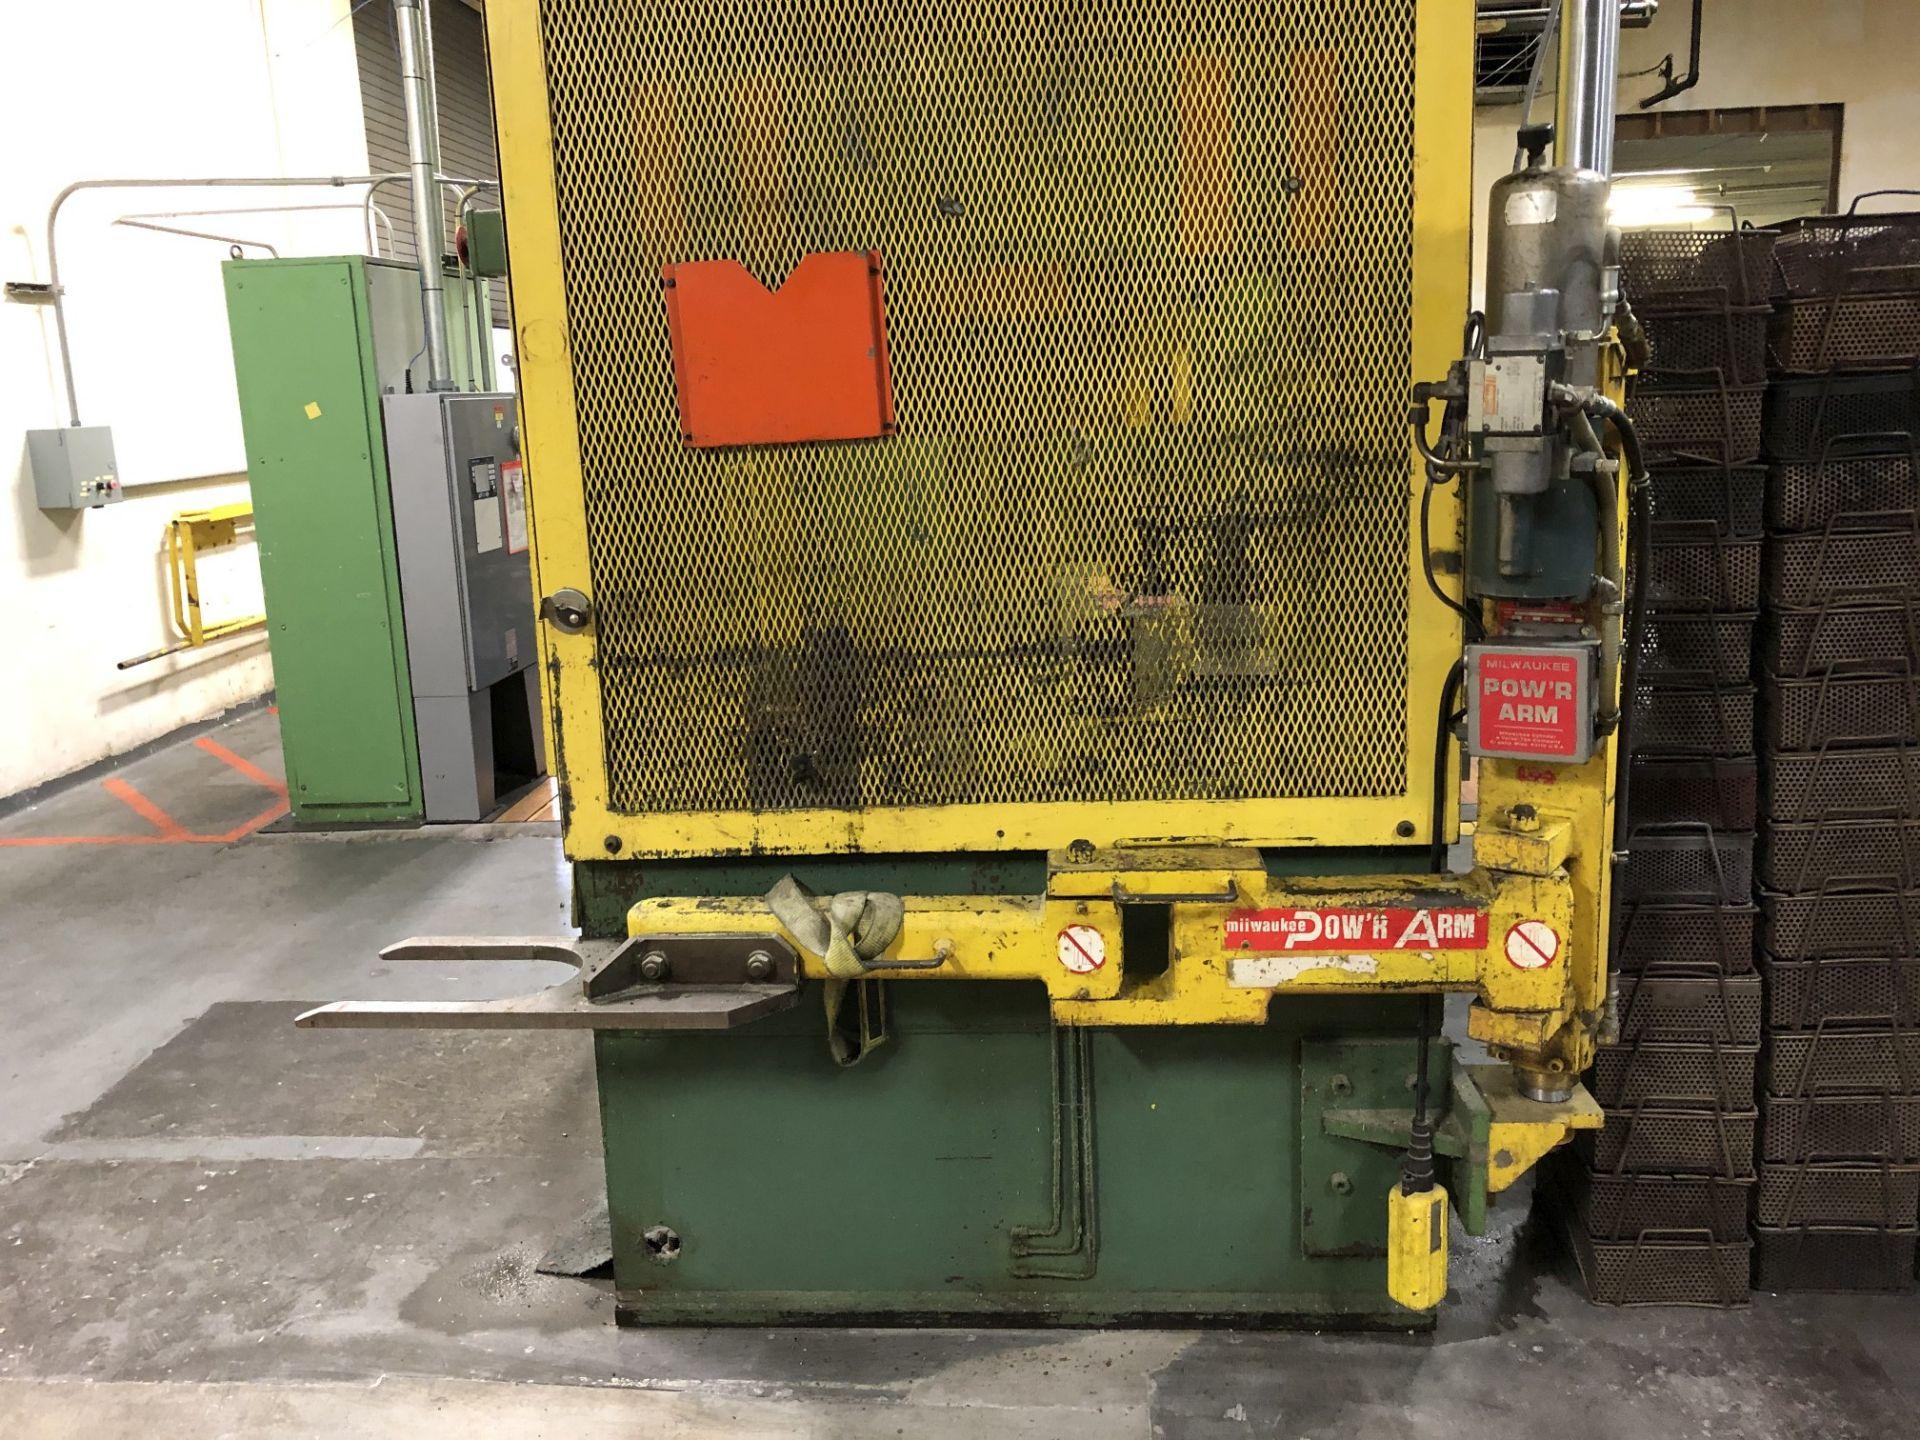 570 Ton Advanced Machine Design Straight Side Press - Image 12 of 15